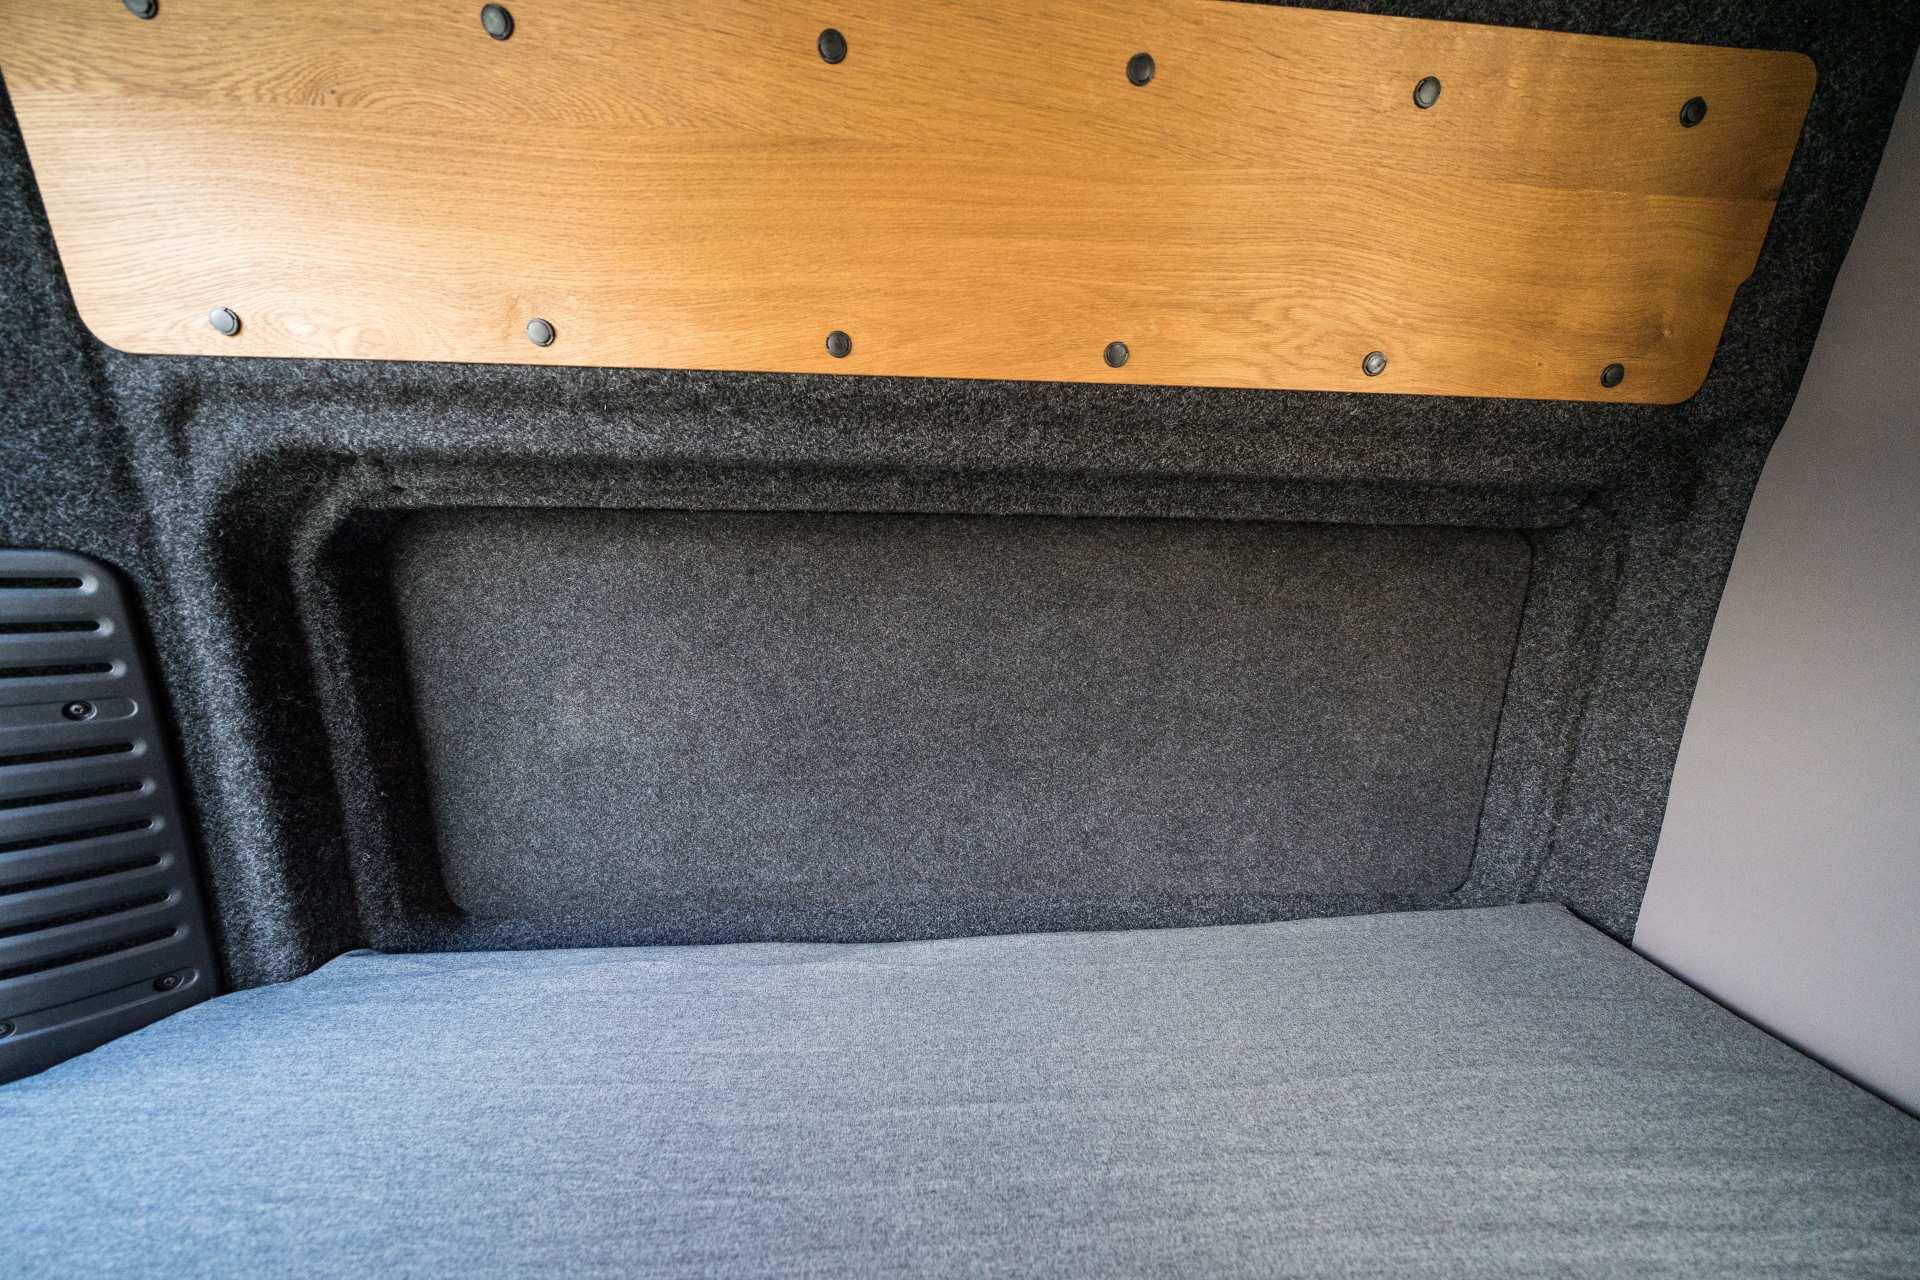 Individualausbau: Zwei-Raumwohnung Peugeot Boxer L2 H2 - 38